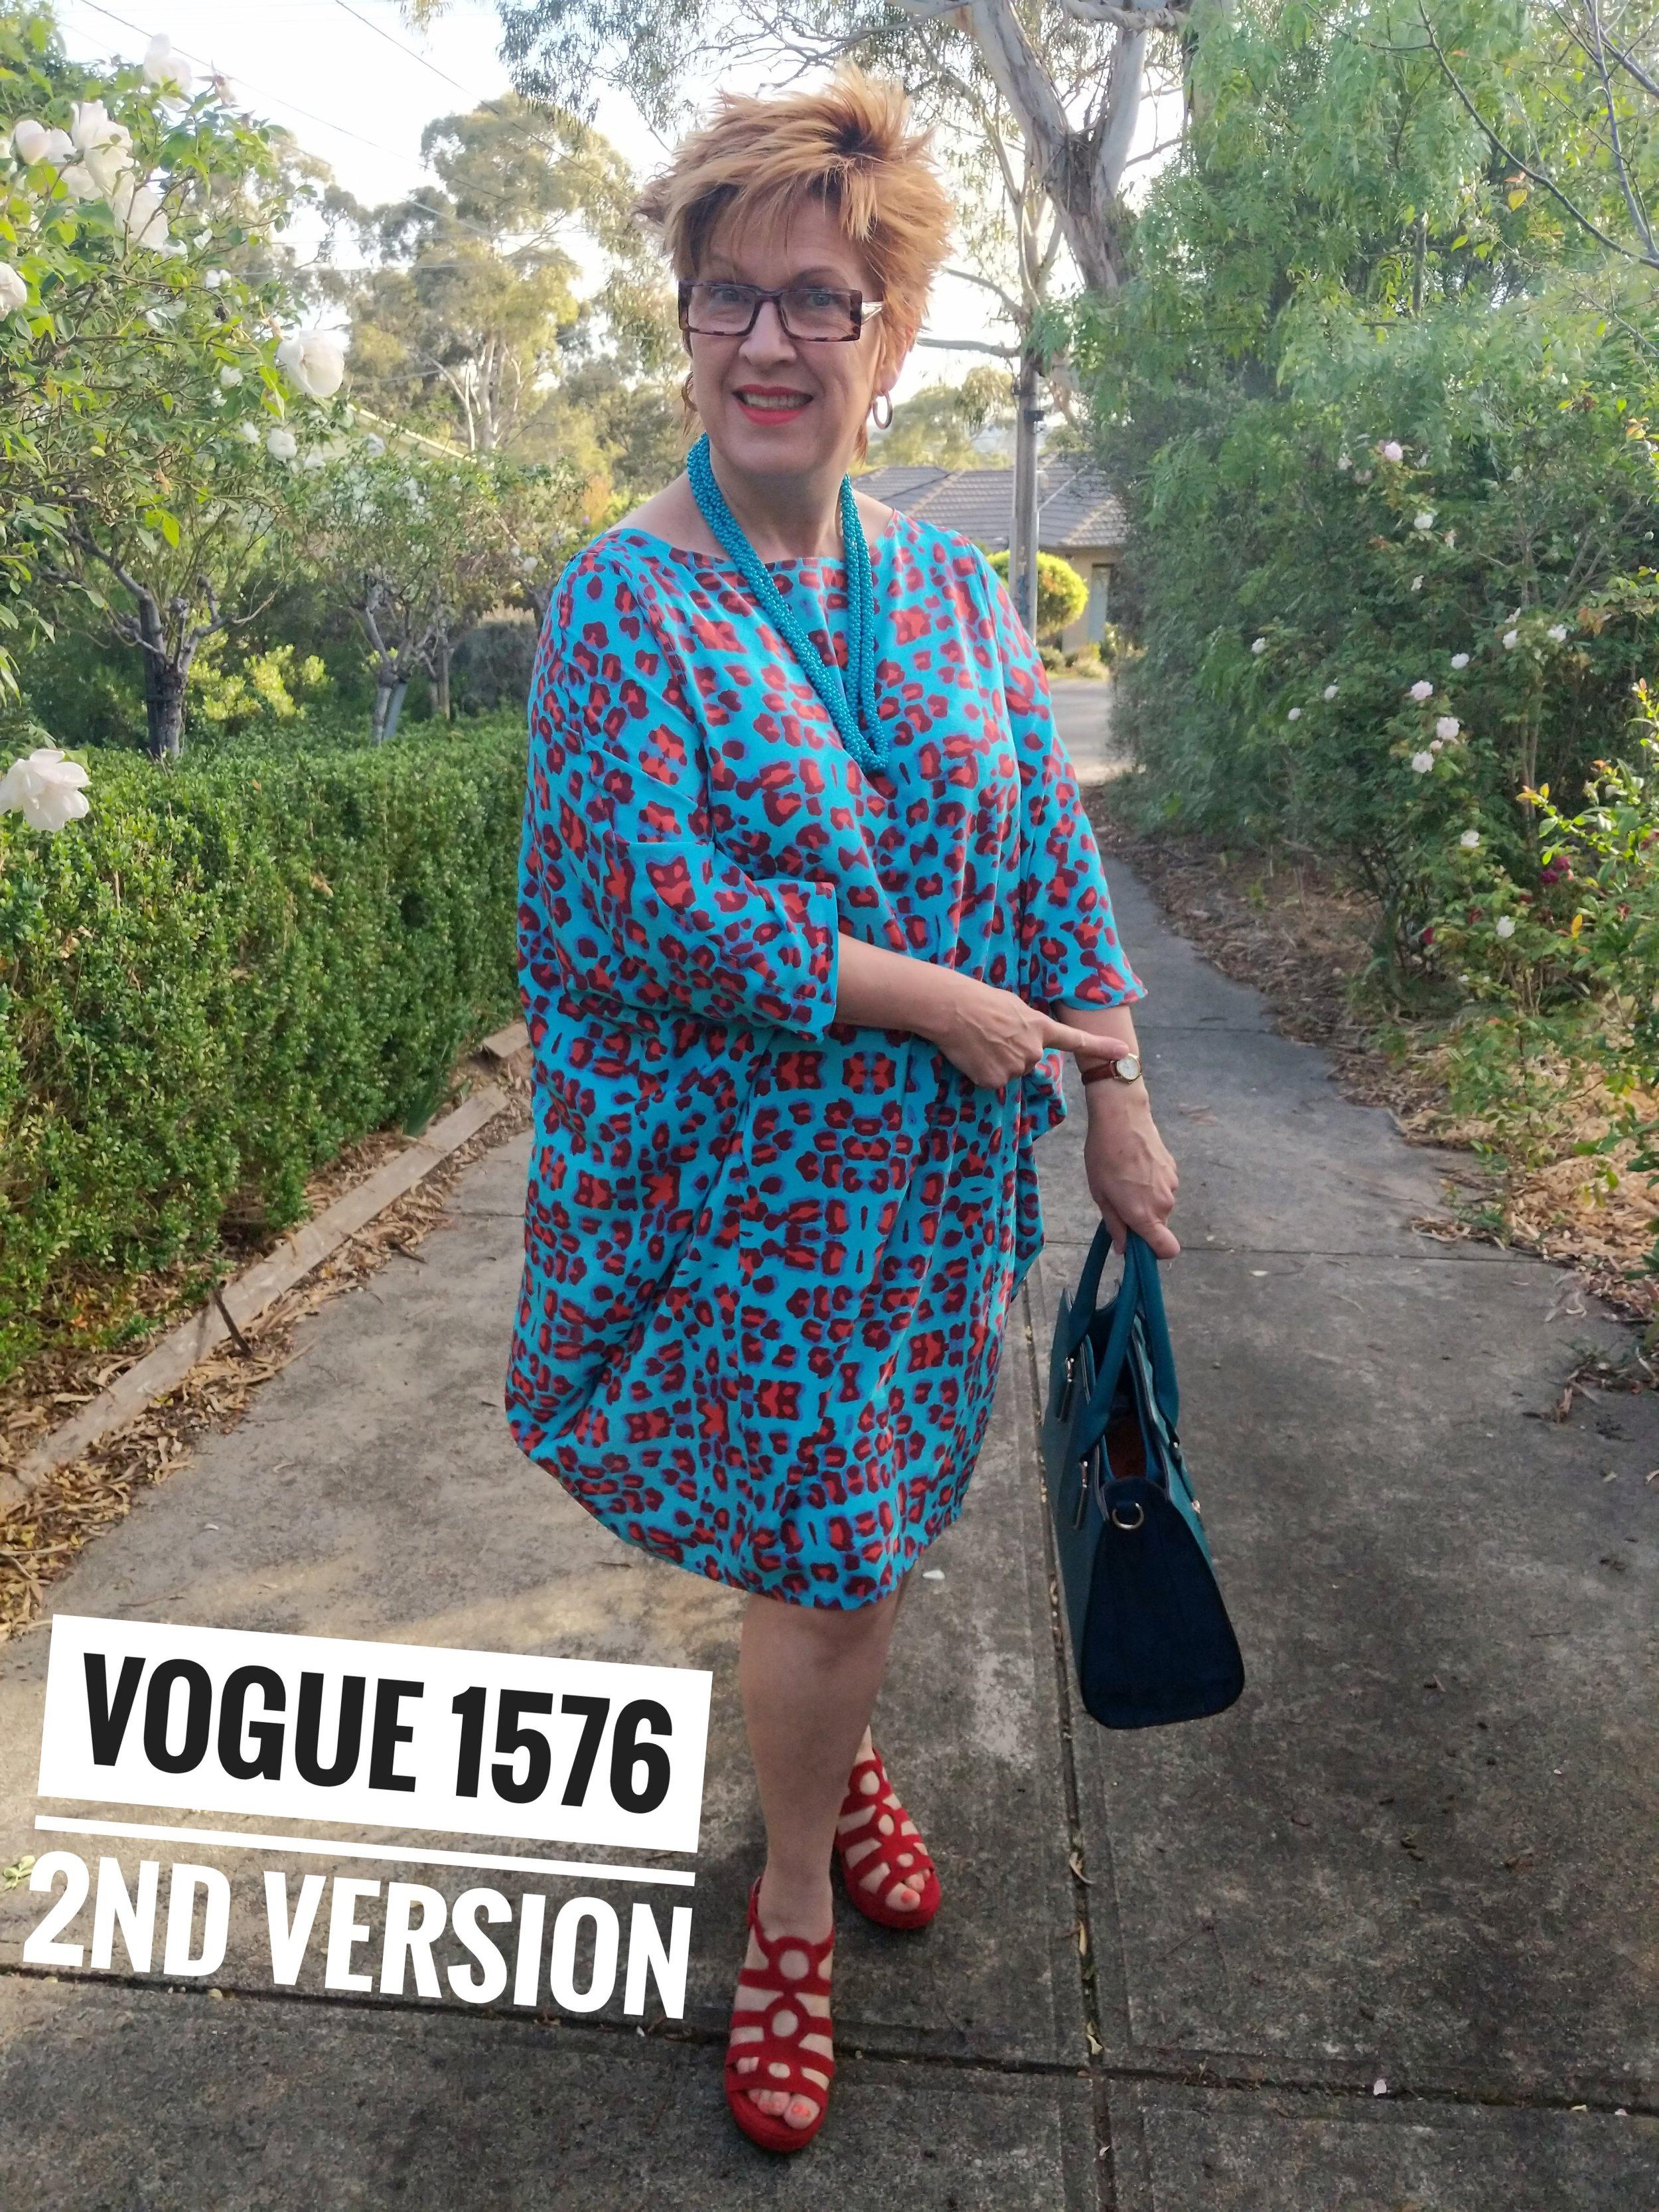 Vogue 1576